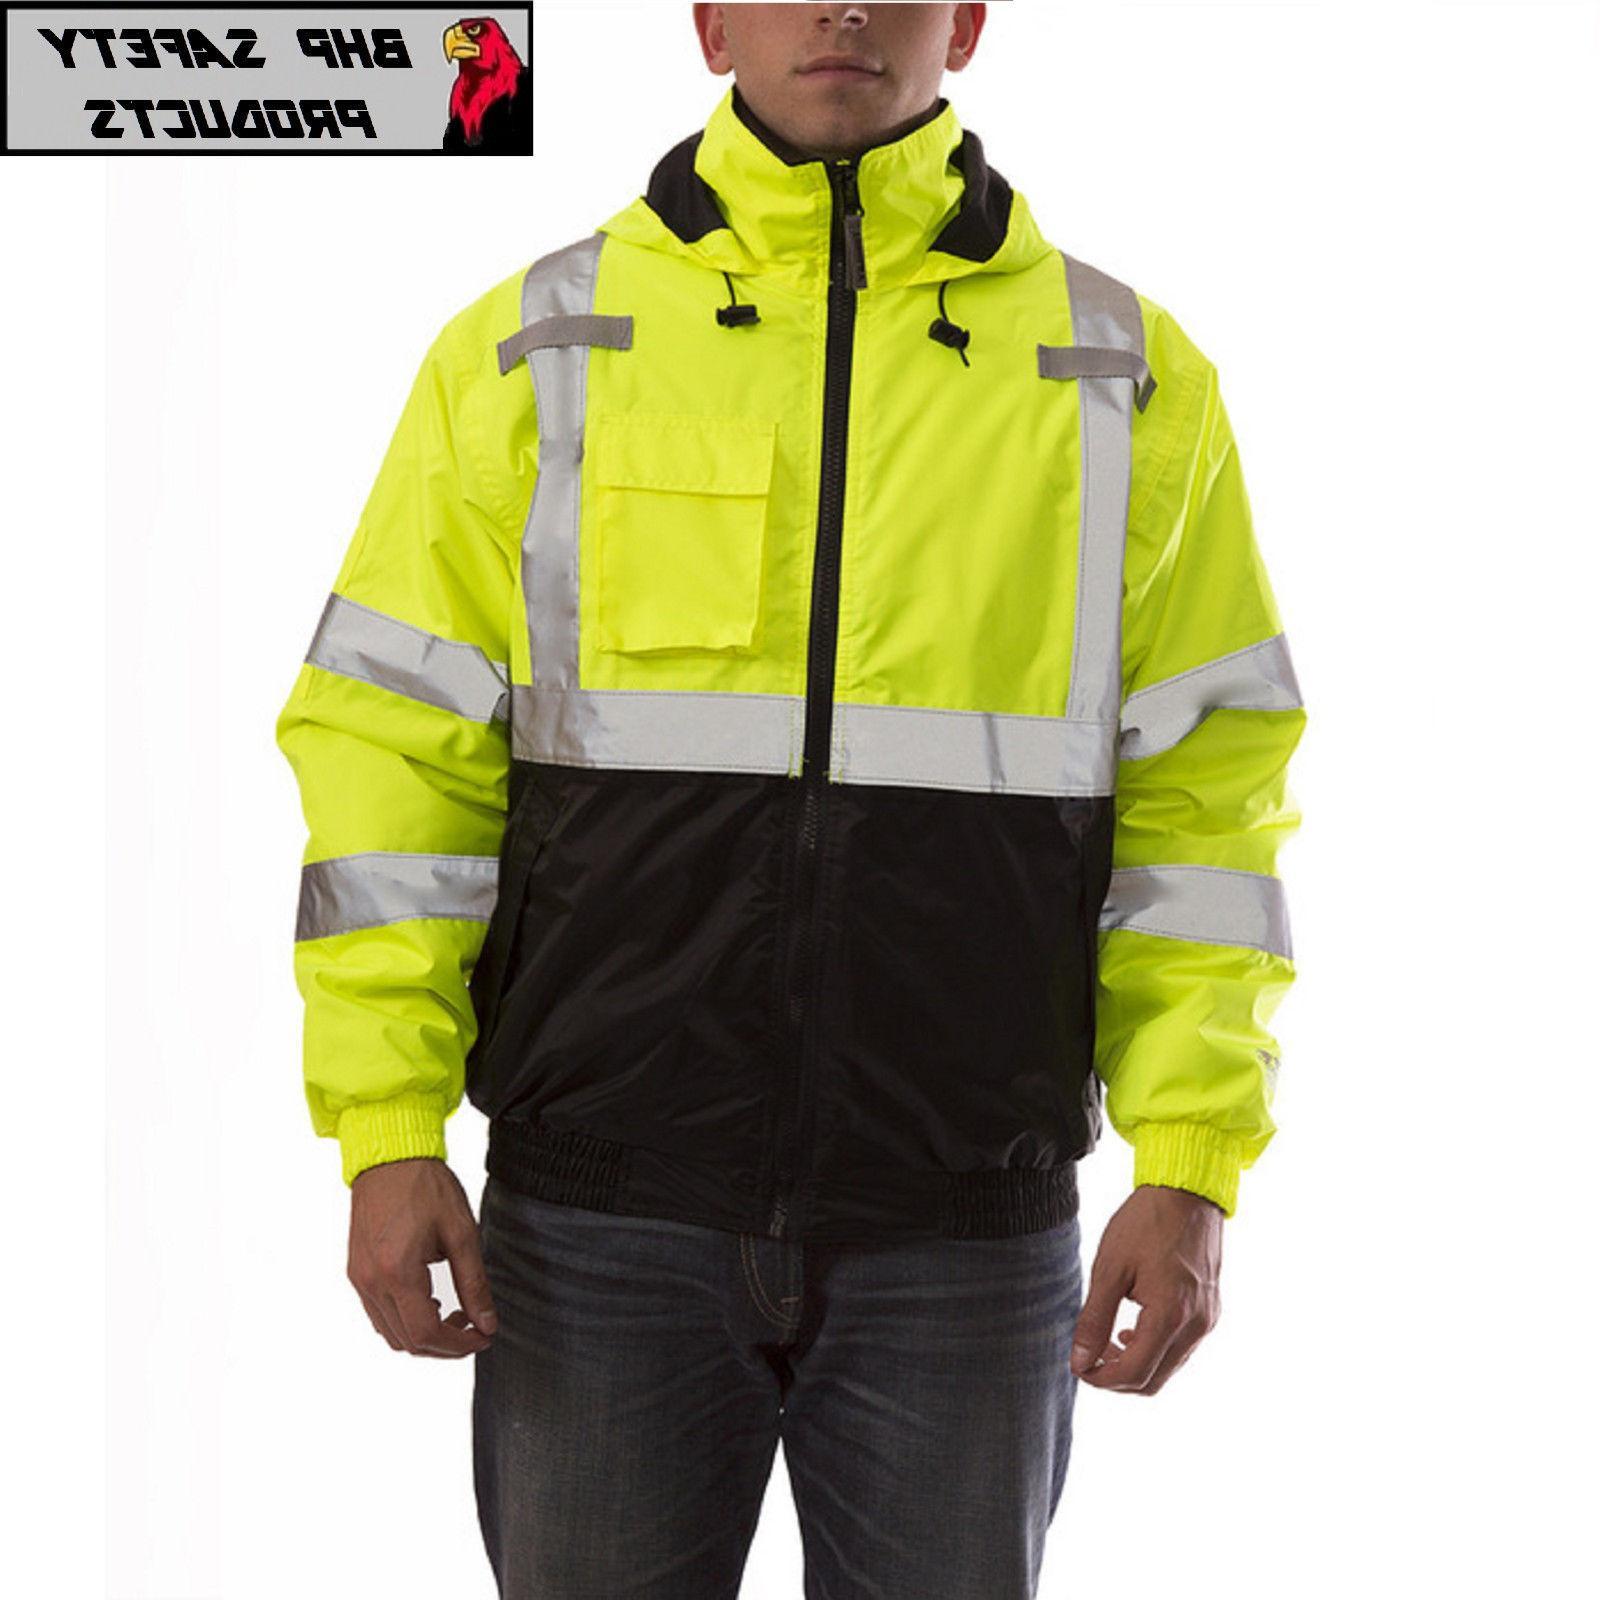 Hi-Vis Insulated Safety Reflective Jacket ROAD WORK